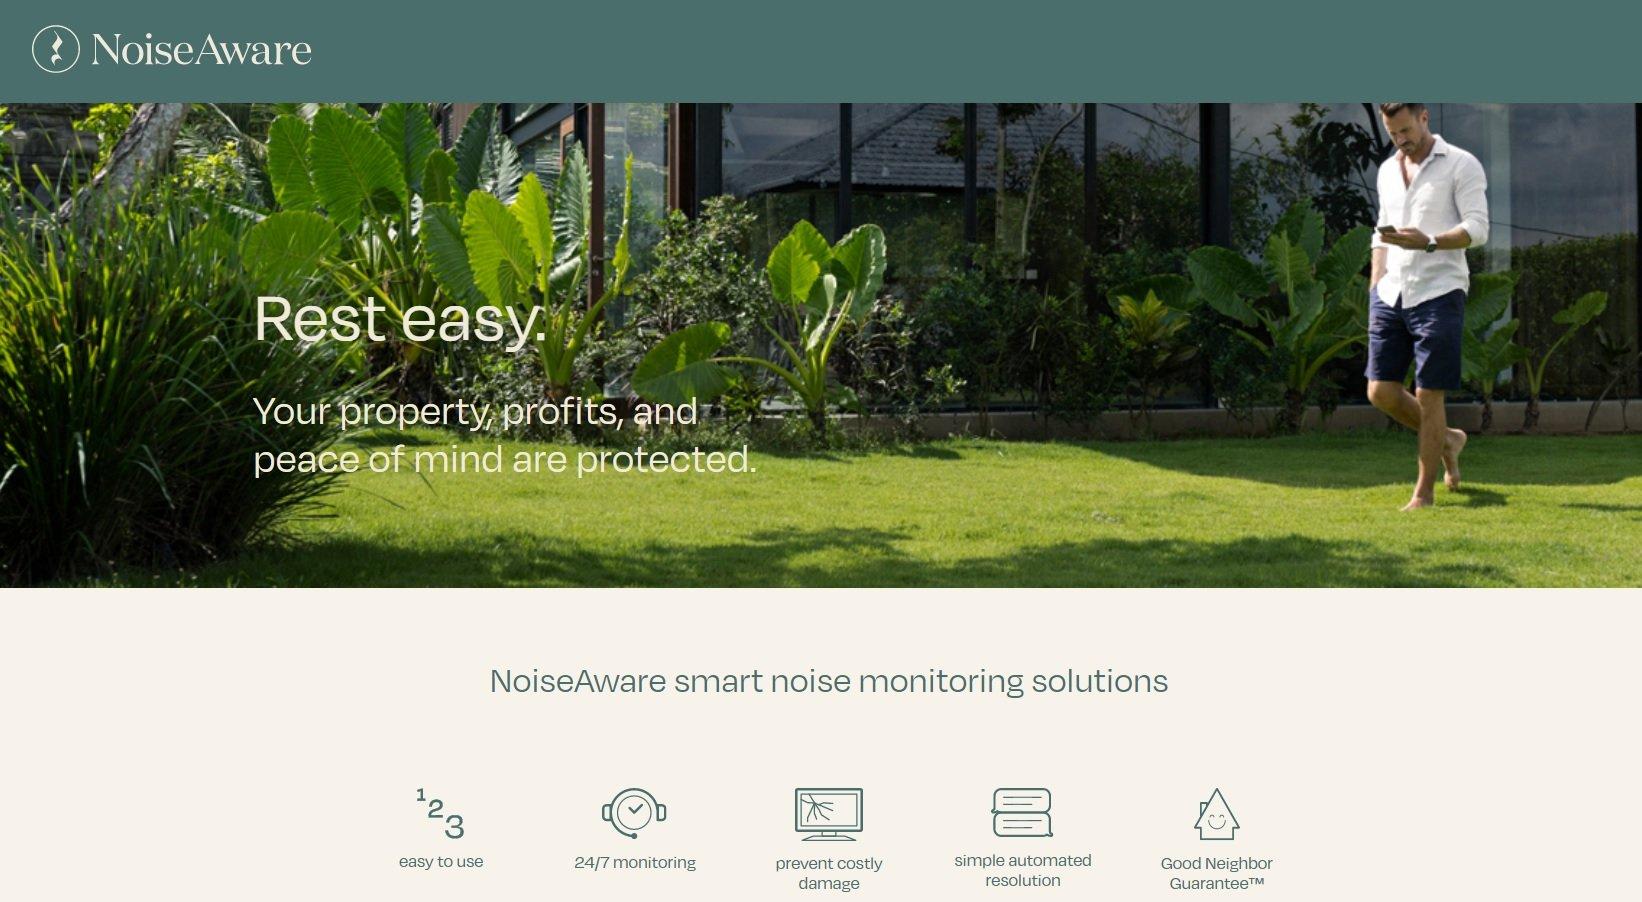 05_NoiseAware is a great form of smart home technology for vacation rentals. NoiseAware website screenshot.